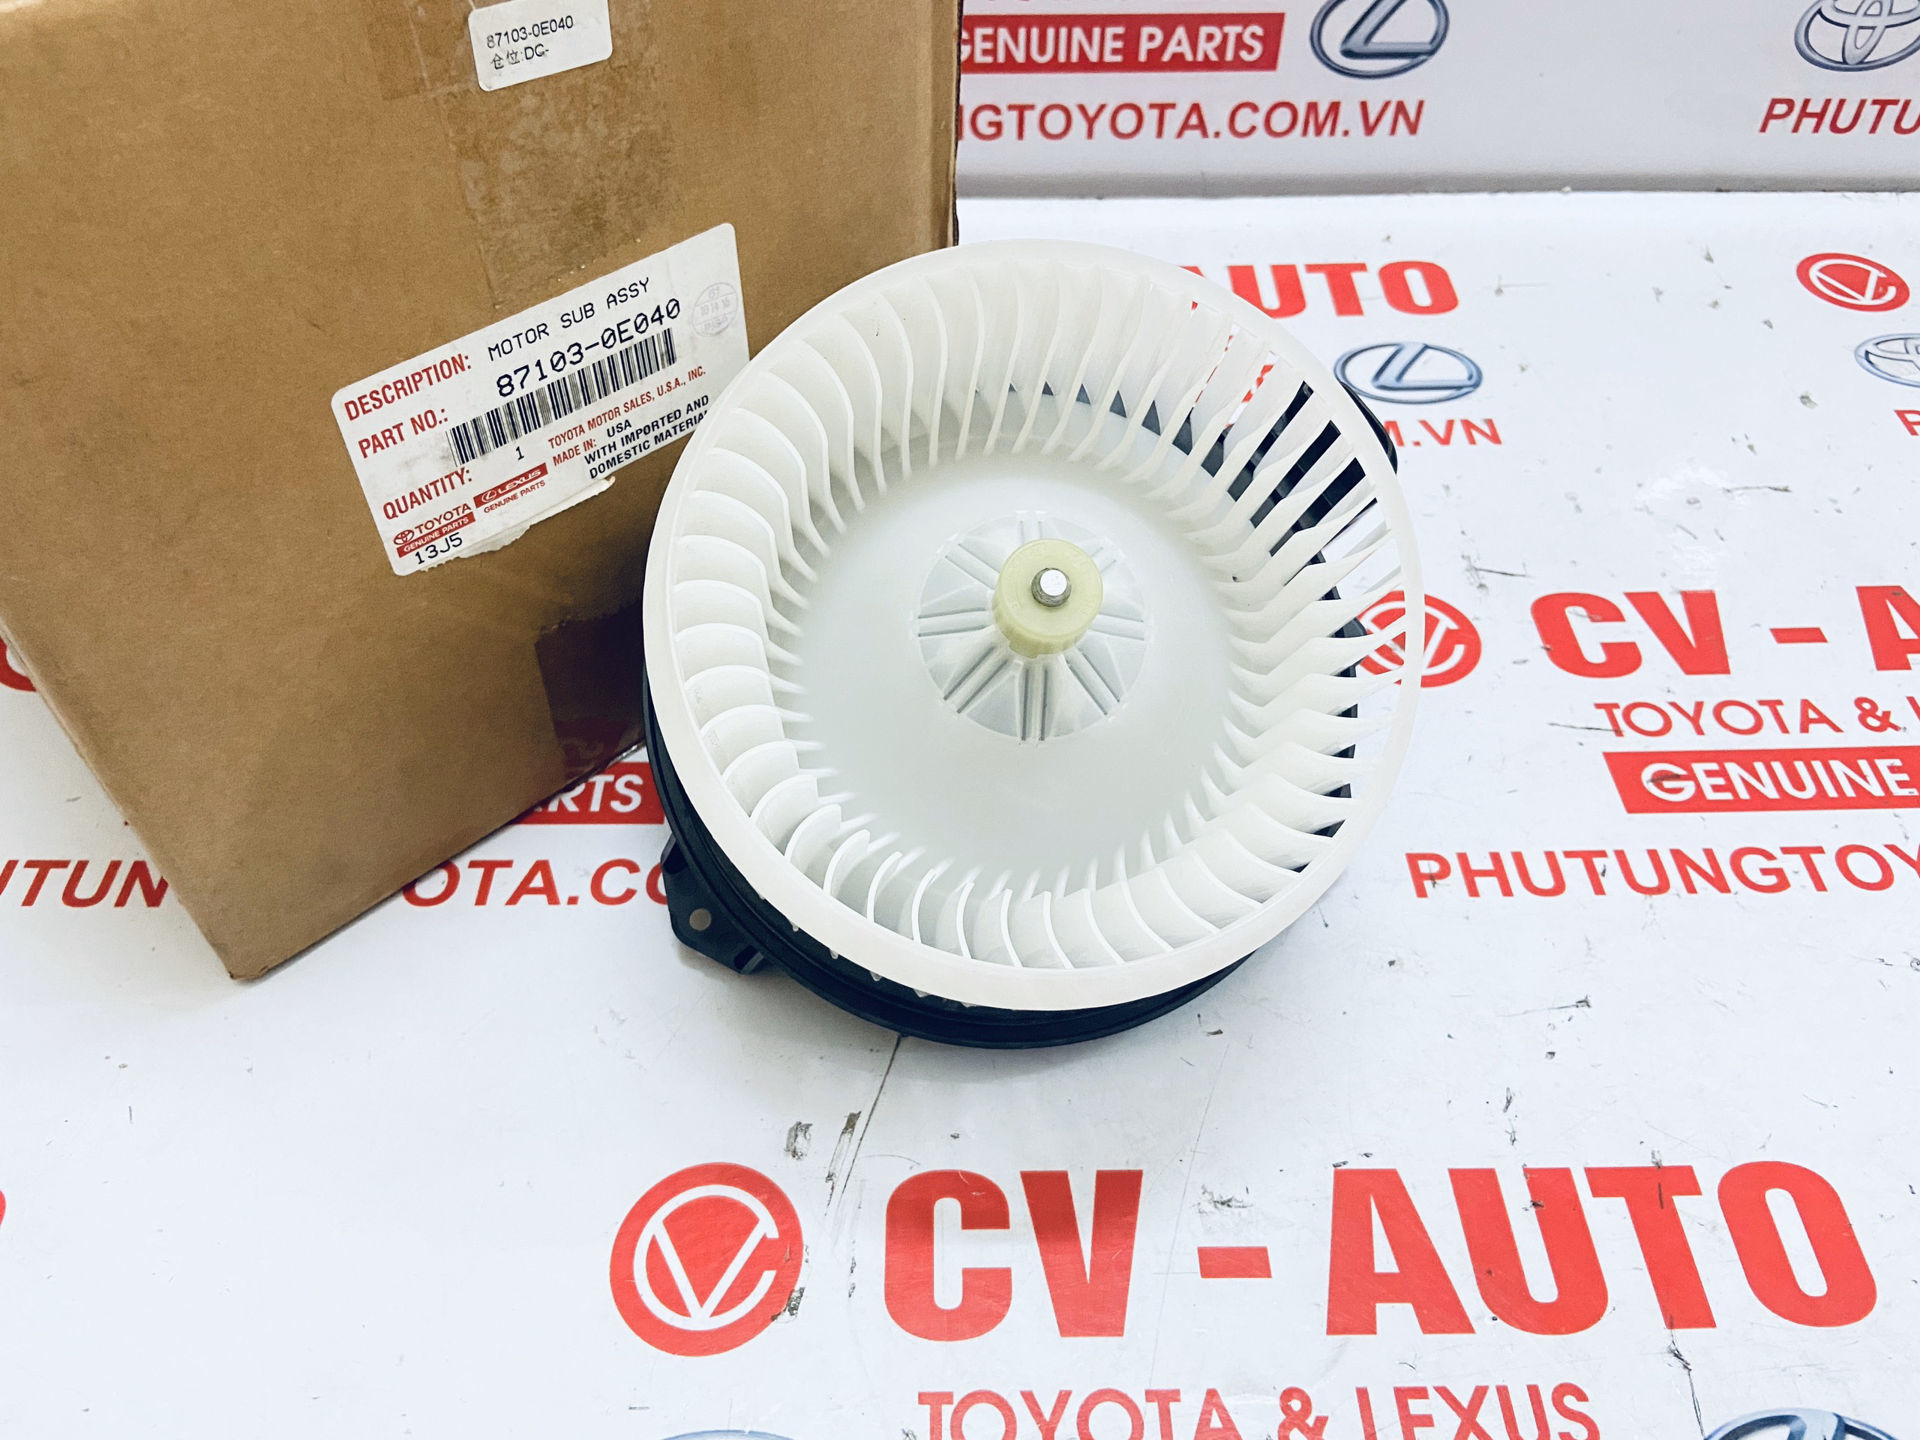 Picture of 87103-0E040 87103-06110 Quạt điều hòa Toyota Camry Venza Highlander Avalon / Lexus RX350 RX450H ES350